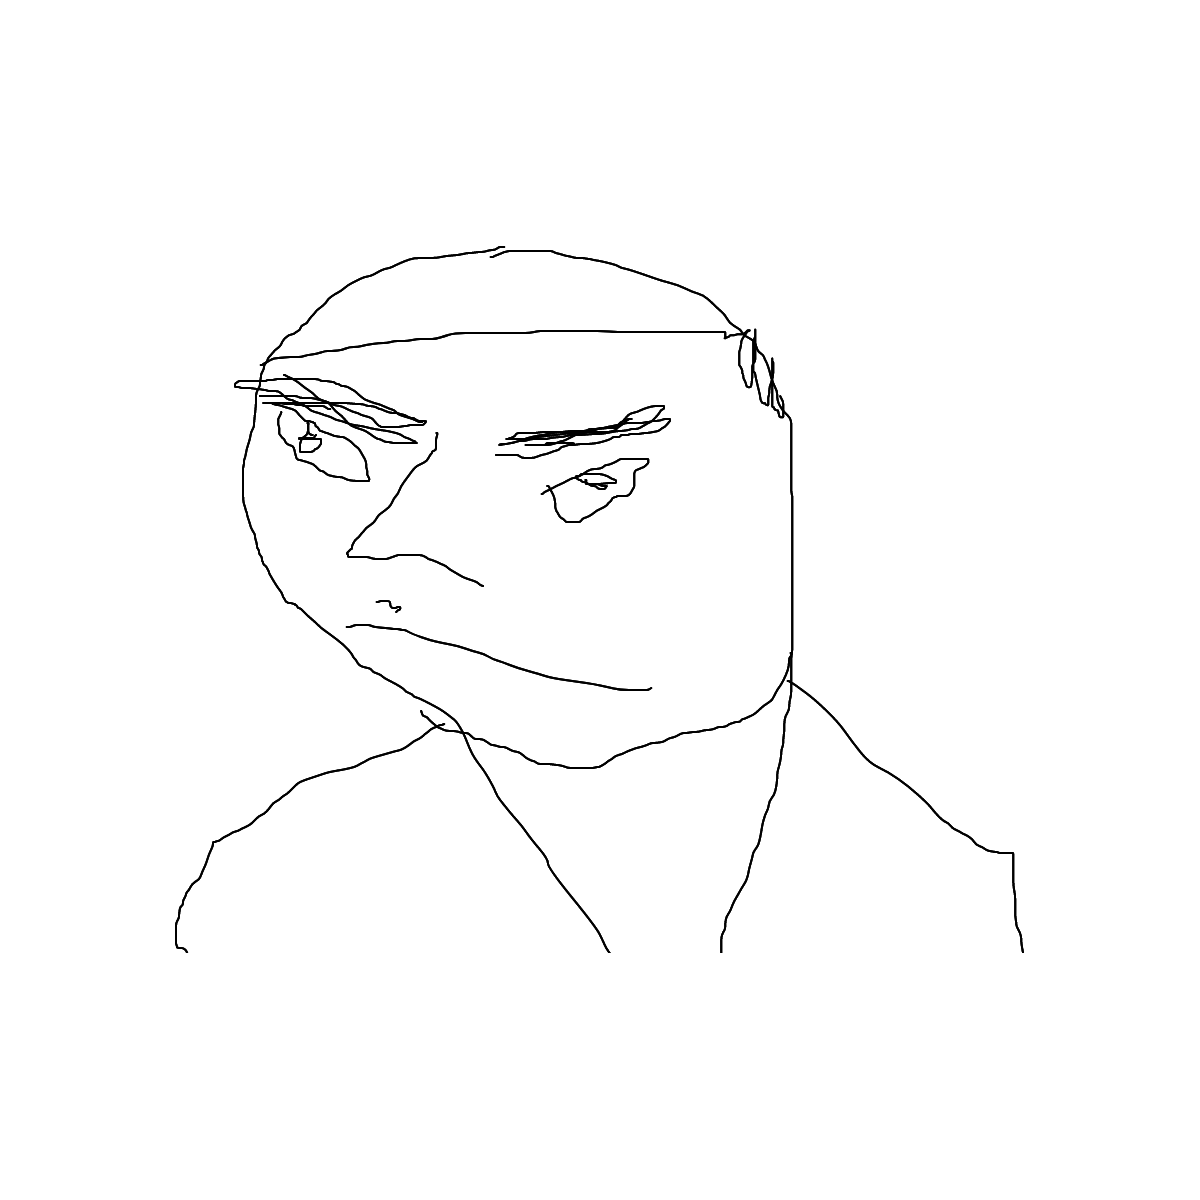 BAAAM drawing#24646 lat:52.4906311035156250lng: 13.4081010818481450